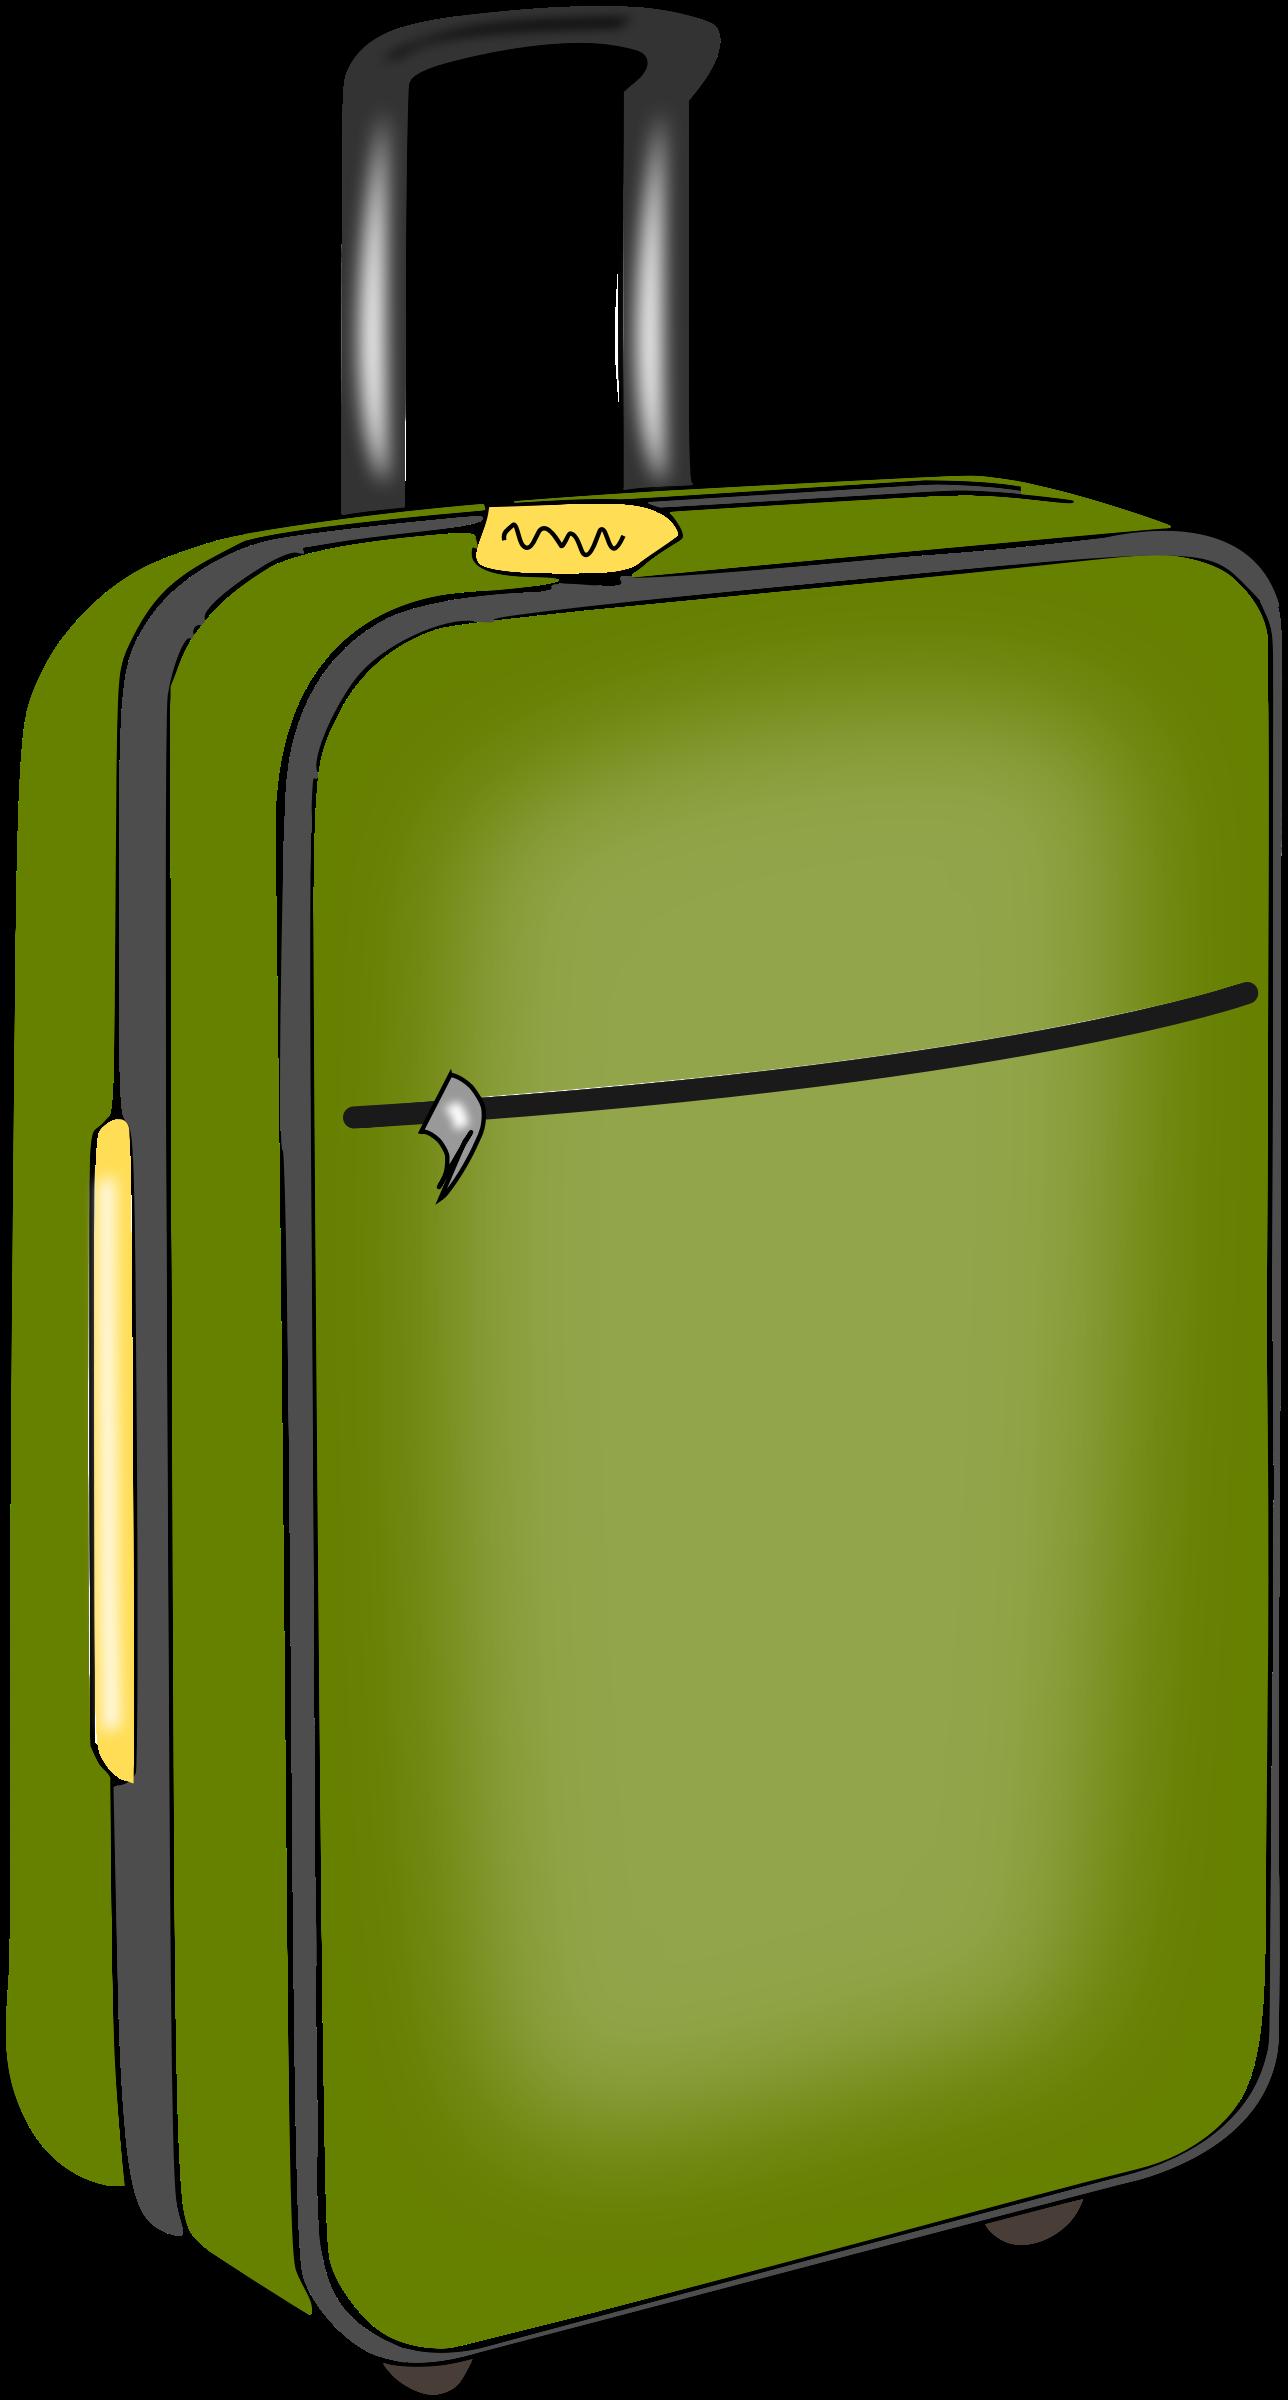 Clip Art Luggage.